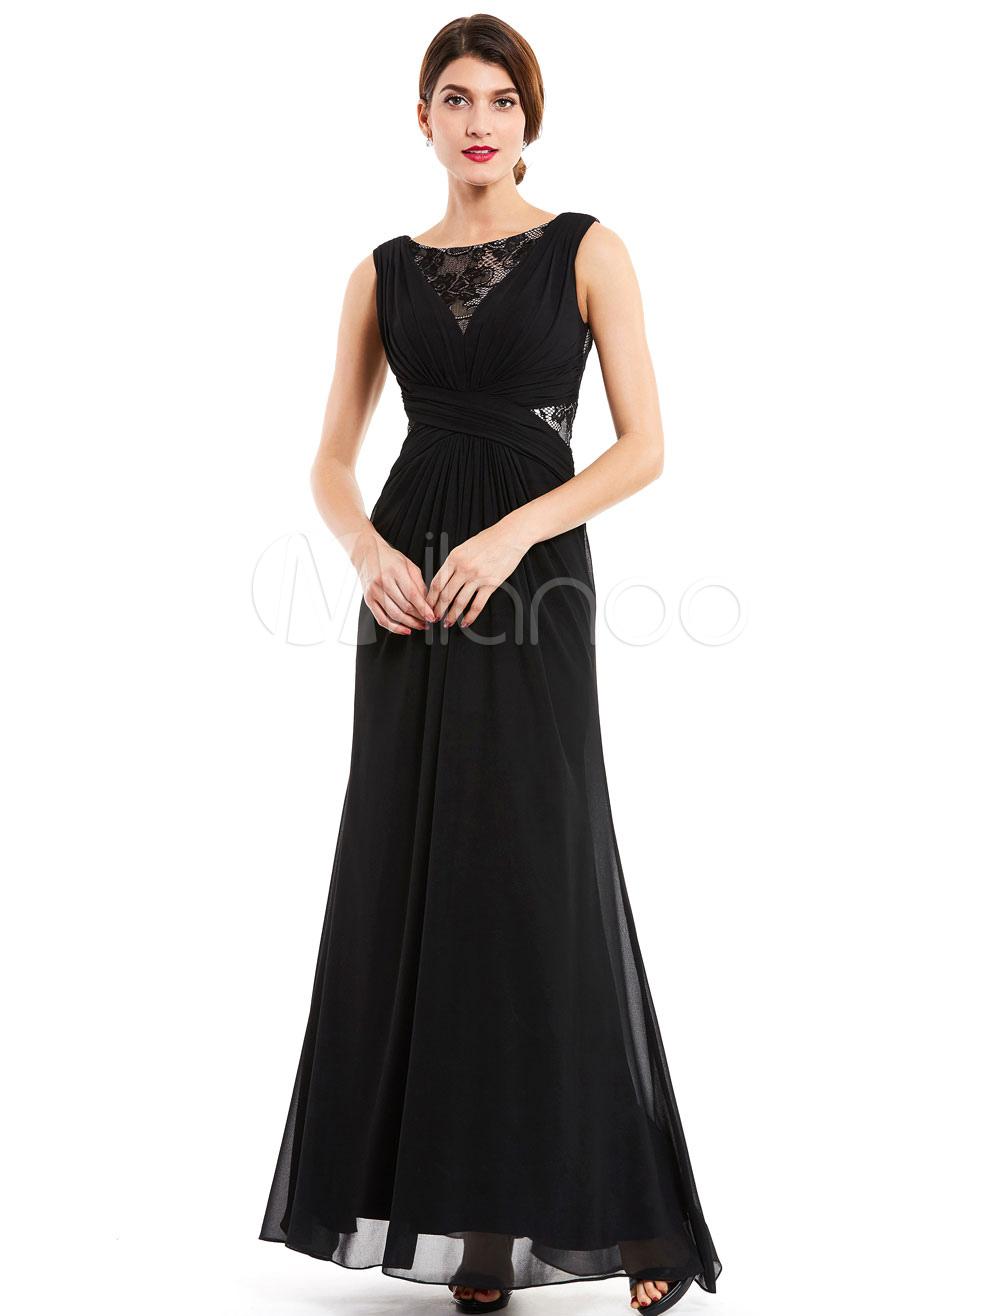 Black Evening Dresses Chiffon Wedding Guest Dress Lace Ruched Criss Cross Sleeveless Floor Length Formal Dress (Cheap Party Dress) photo